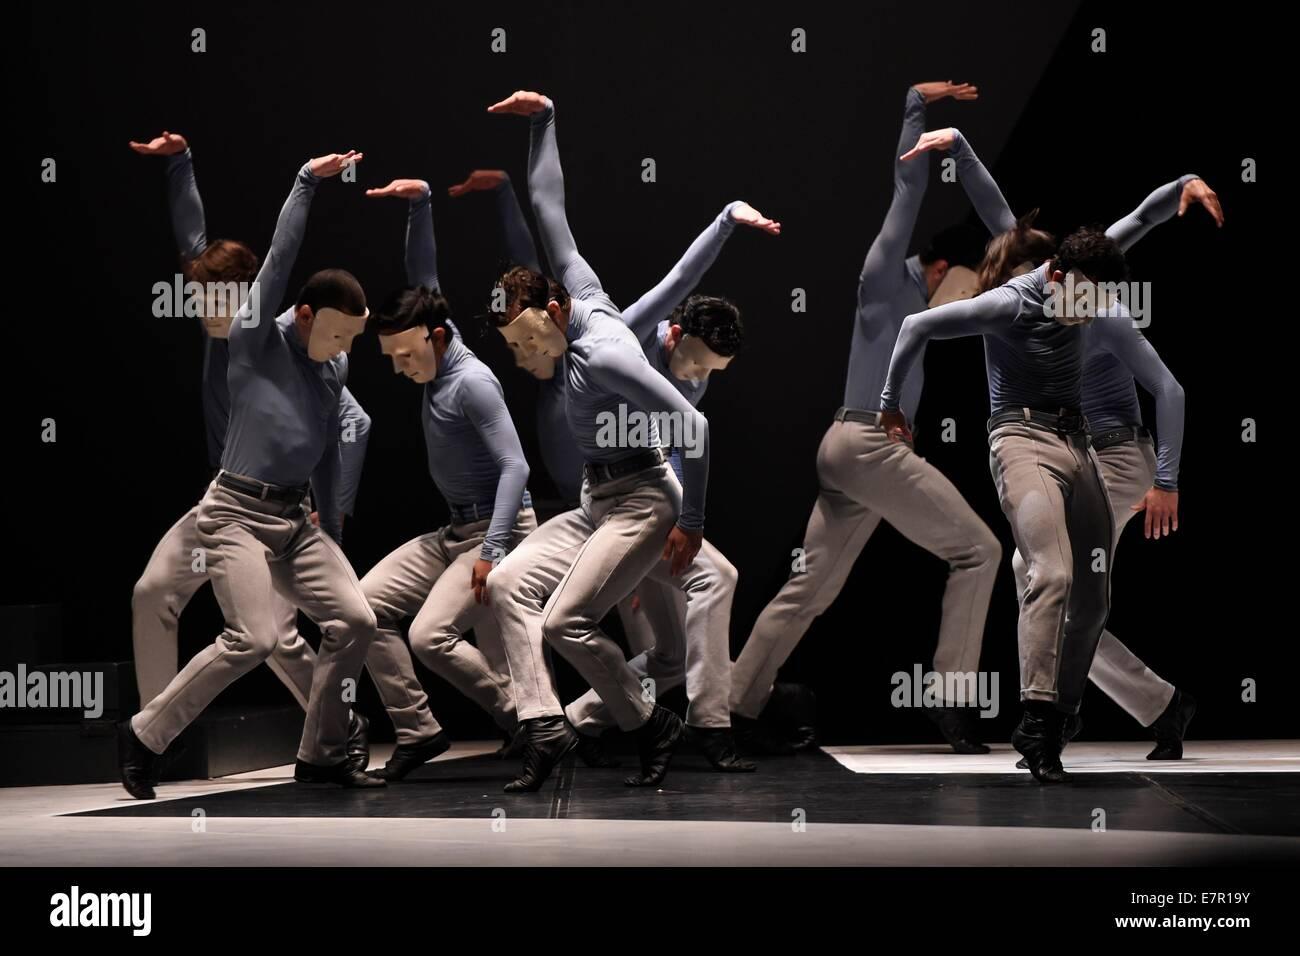 Montevideo, Uruguay. 22nd Sep, 2014. Dancers of Deborah Colker's Troupe perform during the dance show 'Belle', - Stock Image